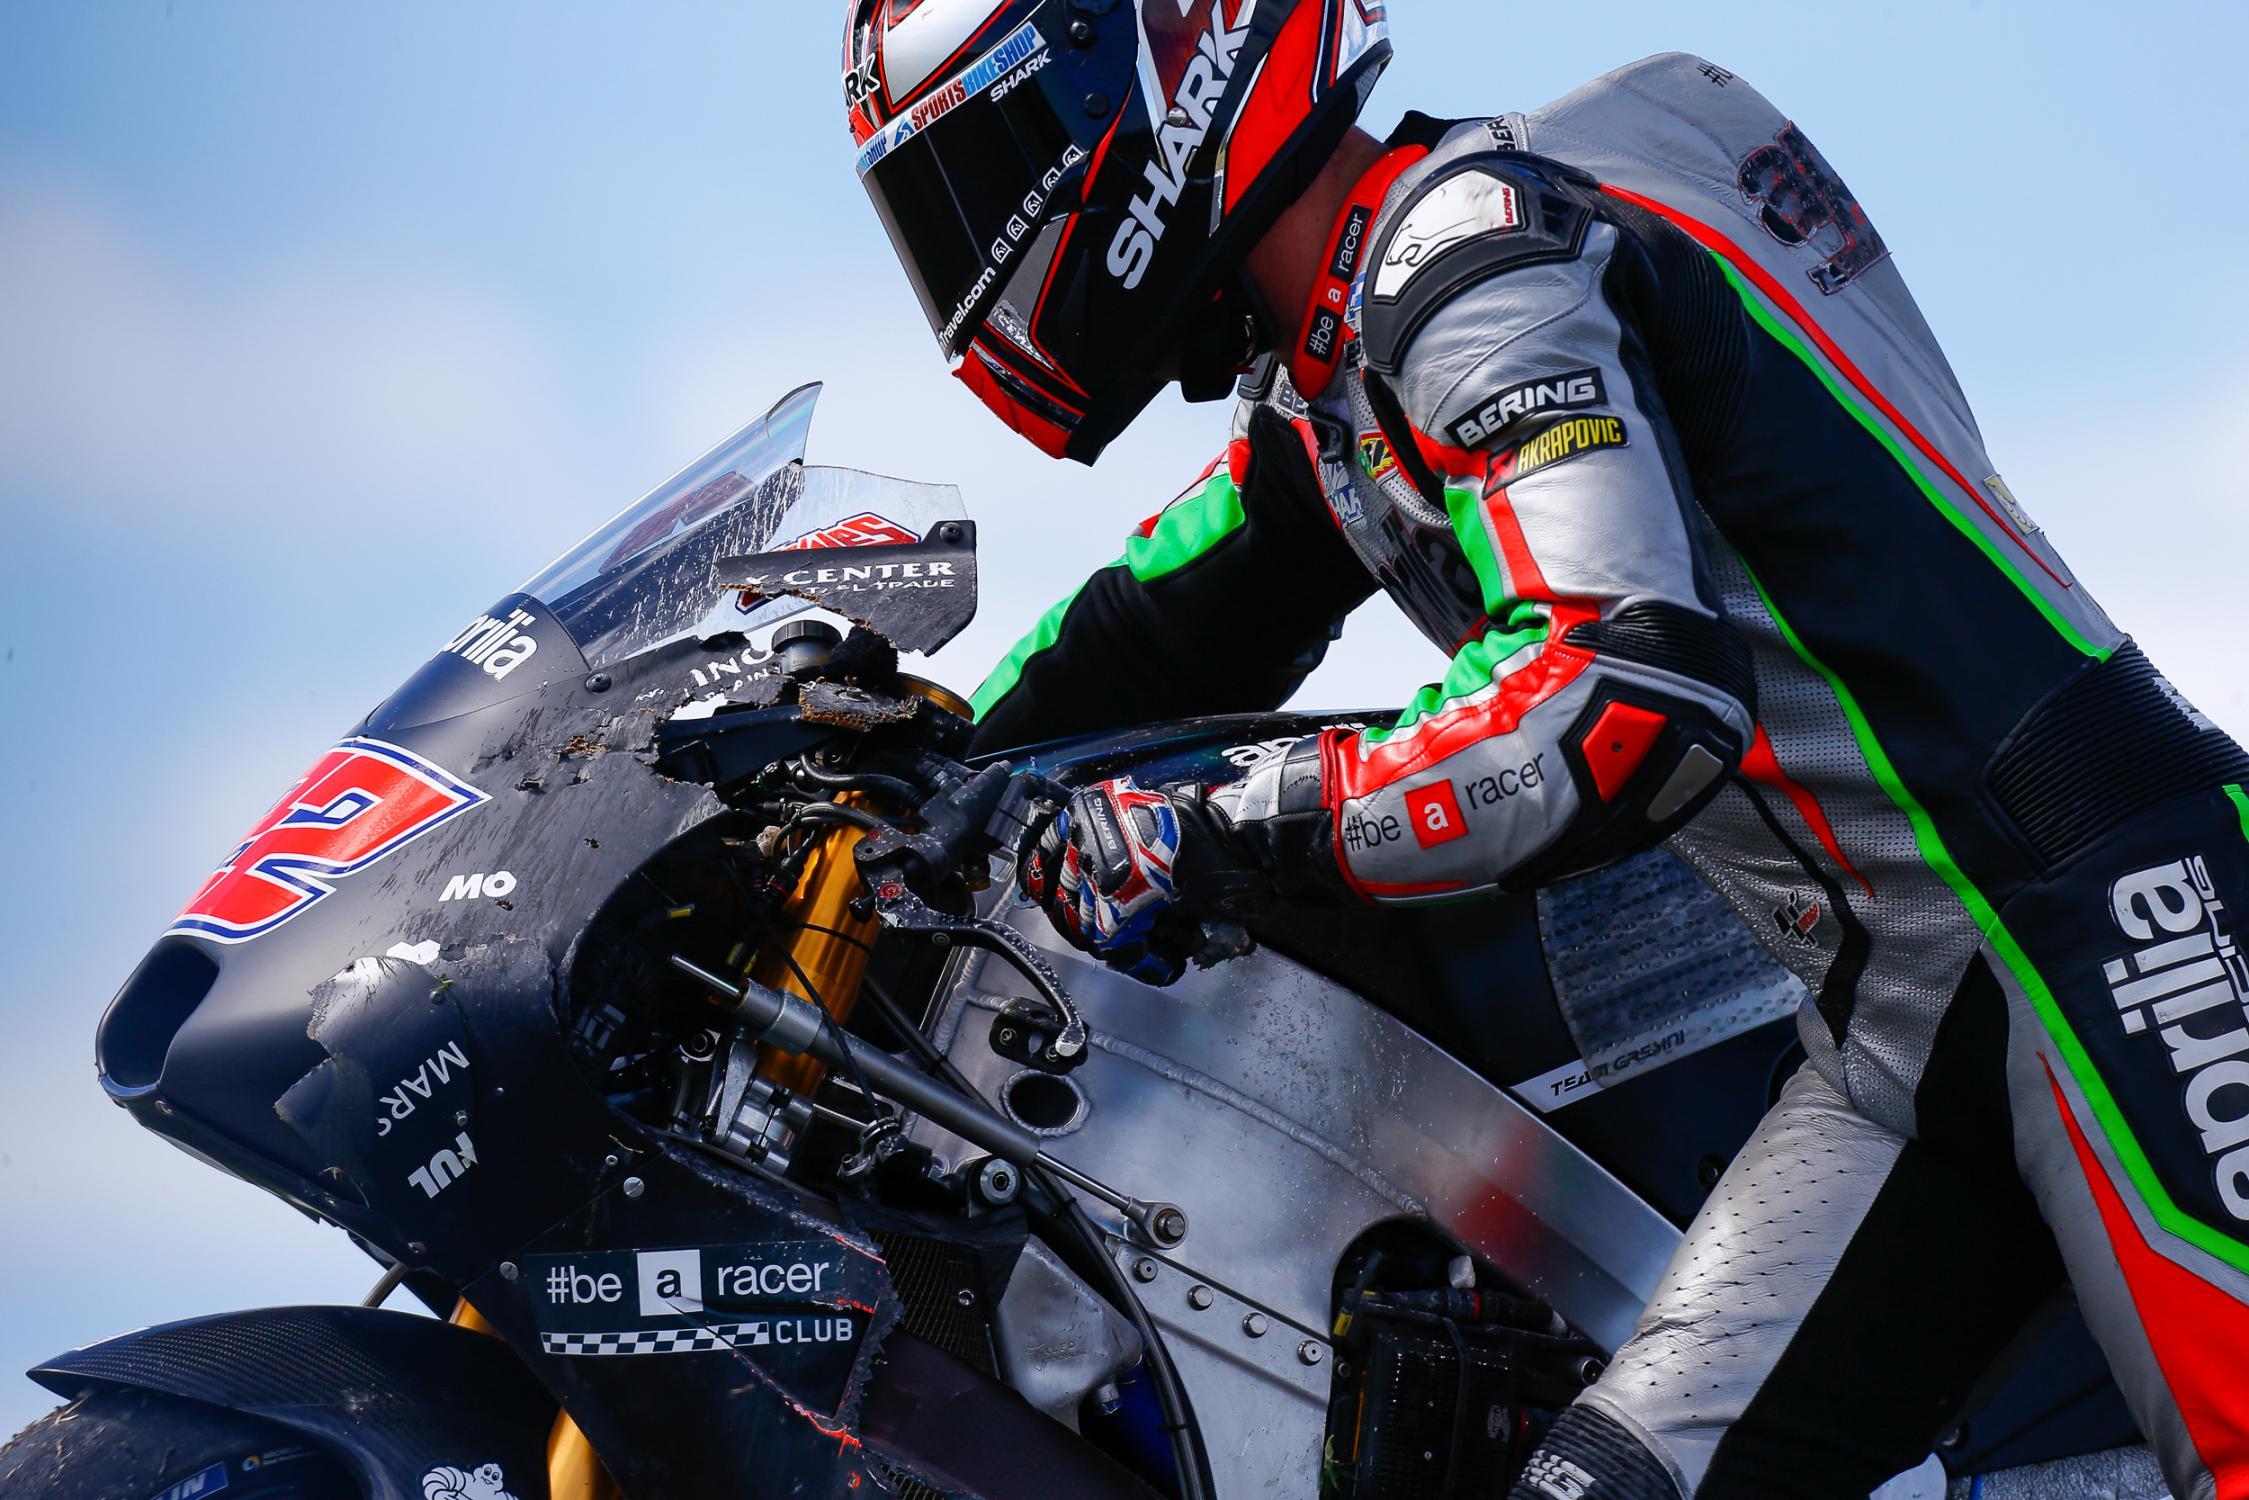 [MotoGP] Test Phillip Island 22-sam-lowes-eng-motogp-2017-action-australia-motogp-phillip-island-pre-season-test03514_test2017_ambience.gallery_full_top_fullscreen